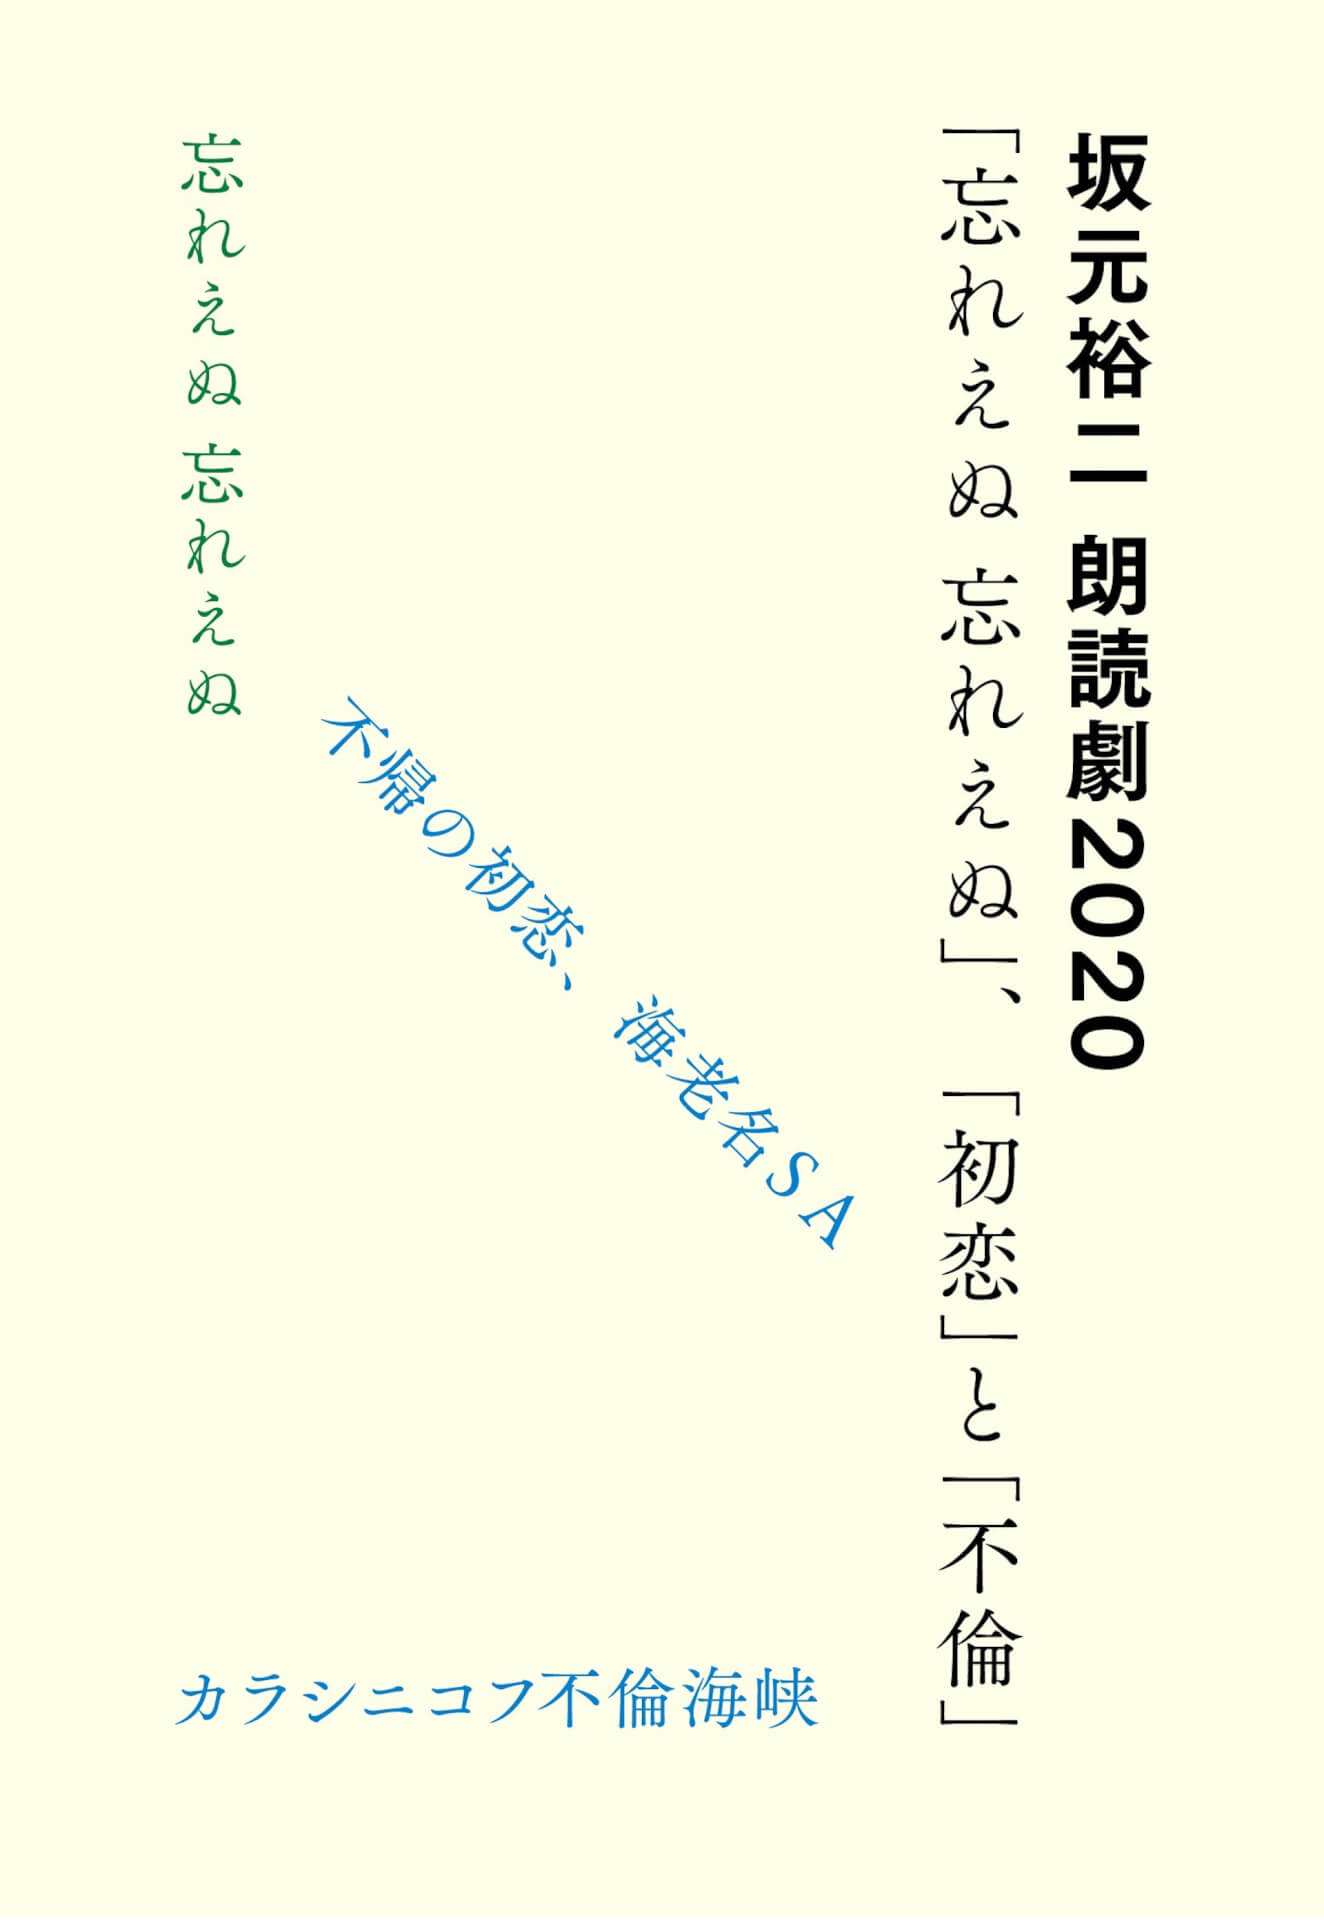 高橋一生、有村架純、松岡茉優らが出演!脚本家・坂元裕二が新作含む3本の朗読劇を東京・大阪で上演 ac200210_sakamotoyuuji_roudoku_02